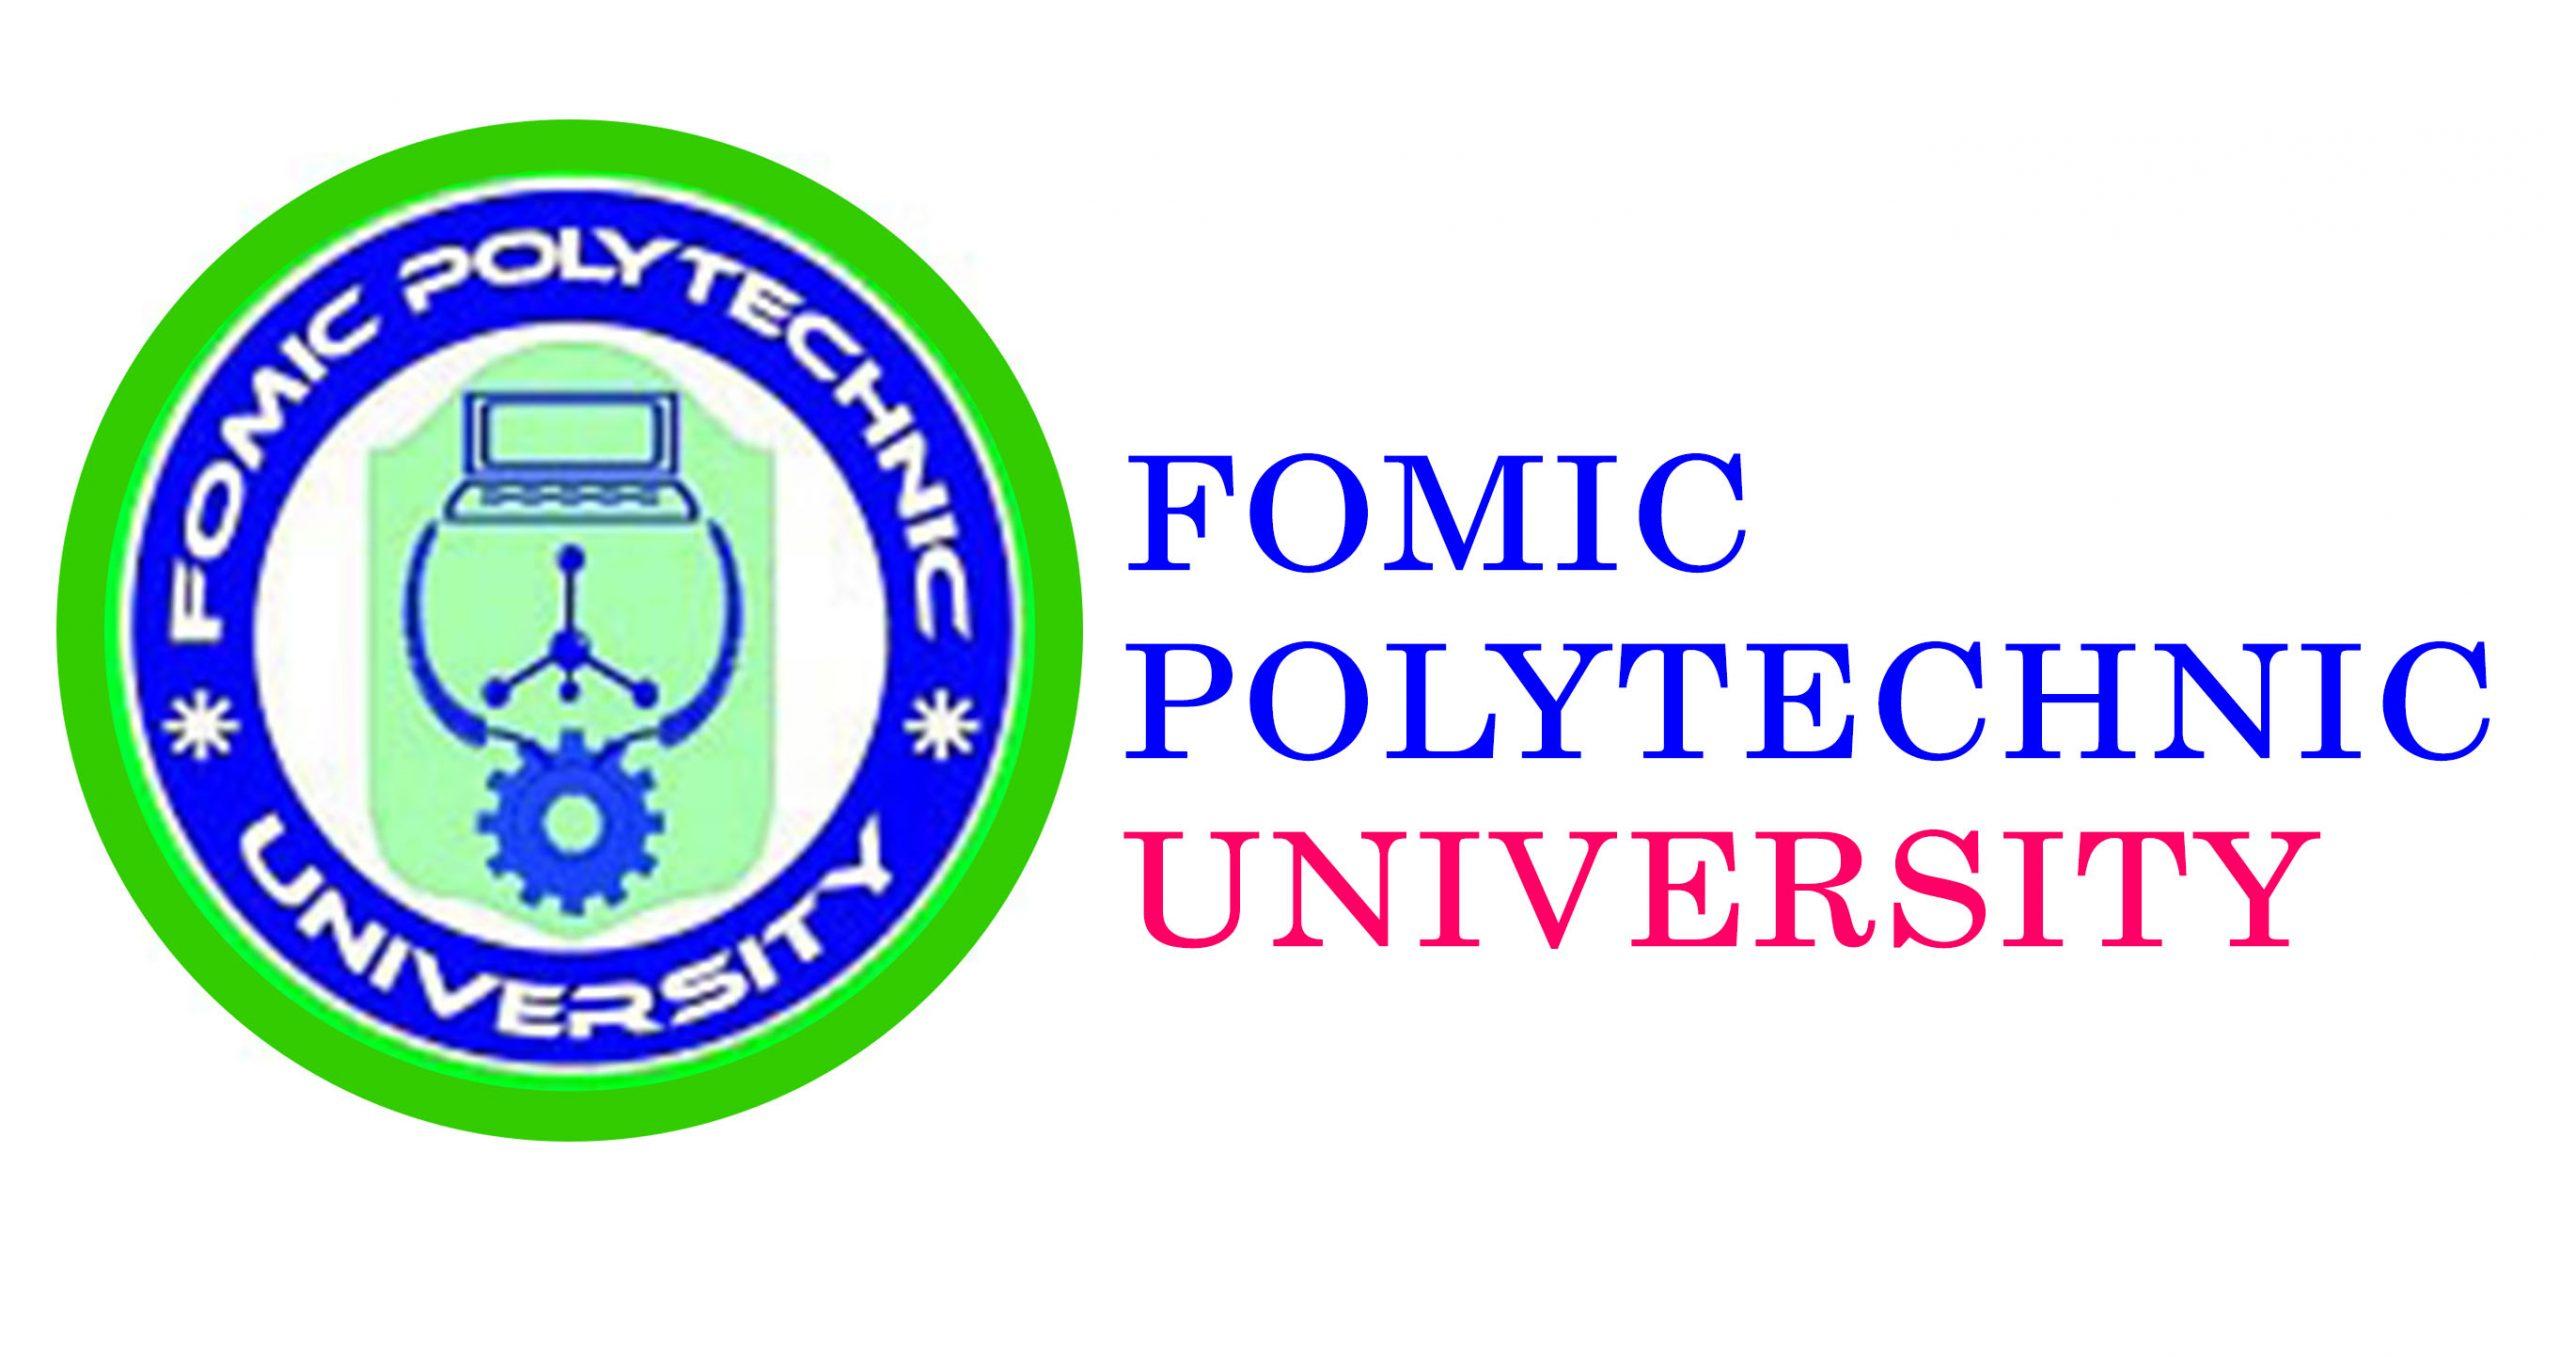 fomic polytechnic university